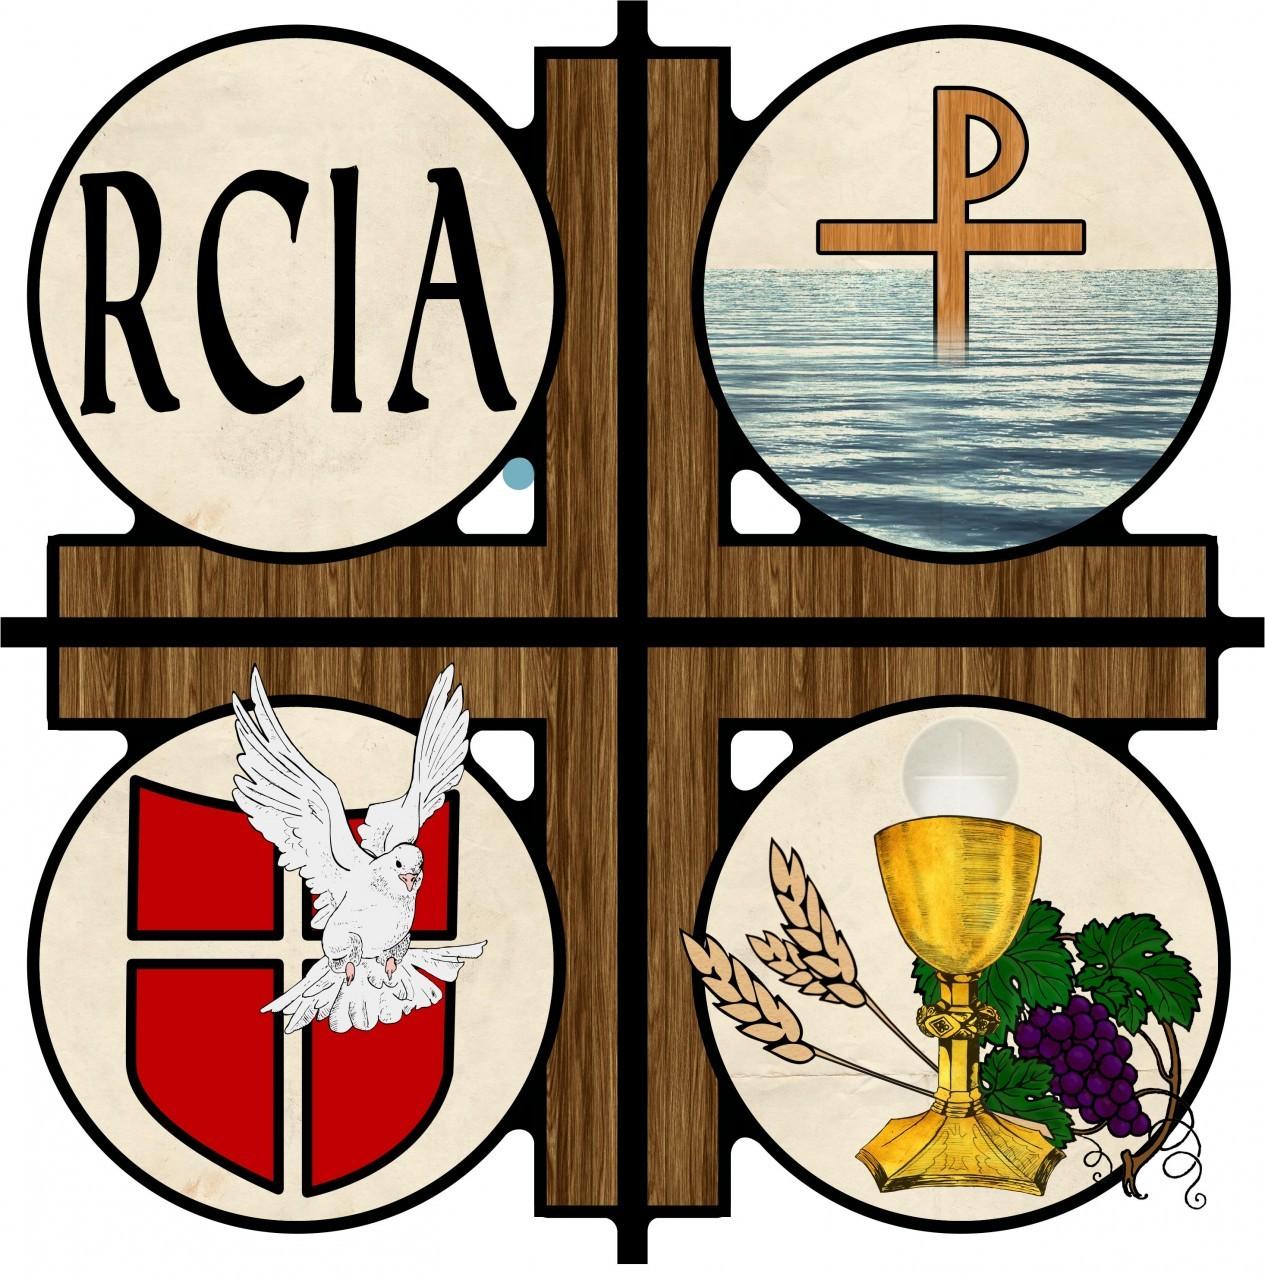 Rcia clipart clipart freeuse download Catholic clipart rcia - 101 transparent clip arts, images ... clipart freeuse download